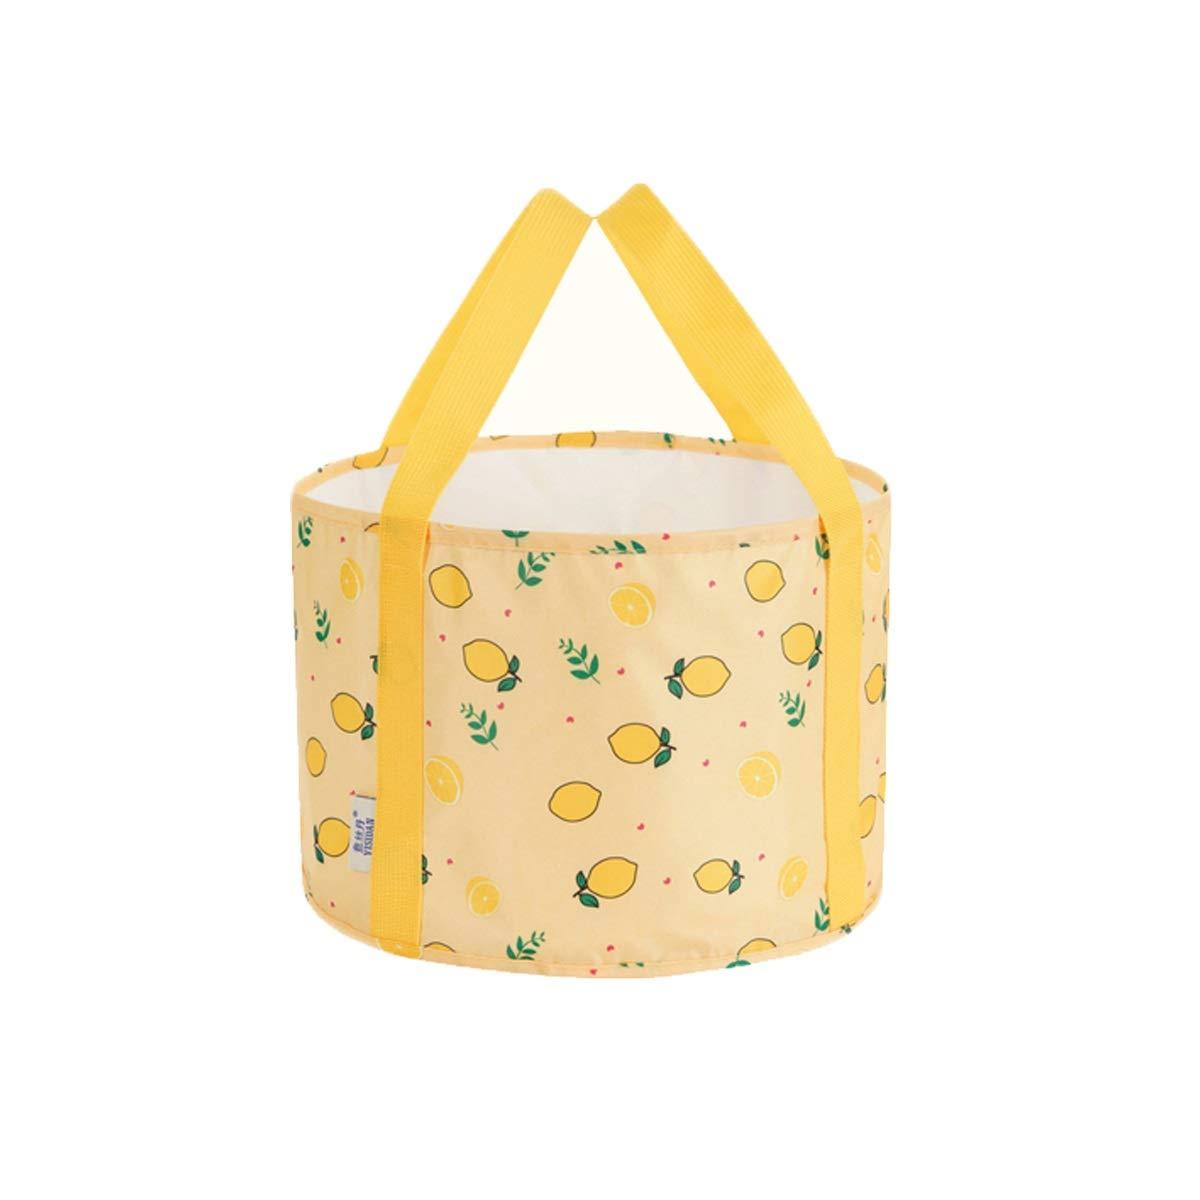 Muziwenju Portable Premium Collapsible Bucket Folding Bucket Wash Basin for Traveling Hiking Fishing Boating Gardening (12L, 18L, 20L) (Capacity : 20L, Color : B)